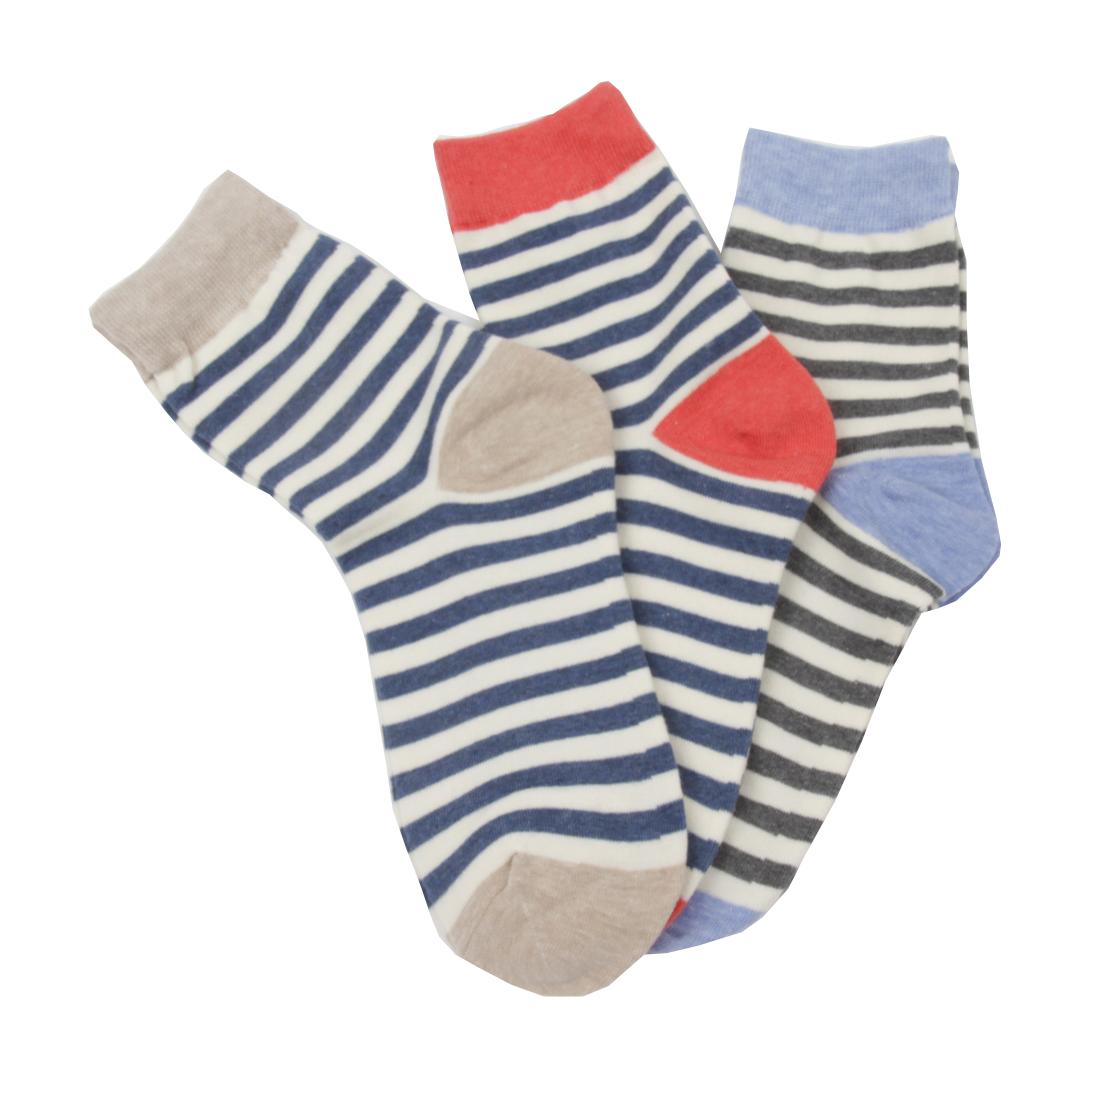 359d9664f4 FloraKoh Women's Cotton Crew Socks 3-Pack Striped